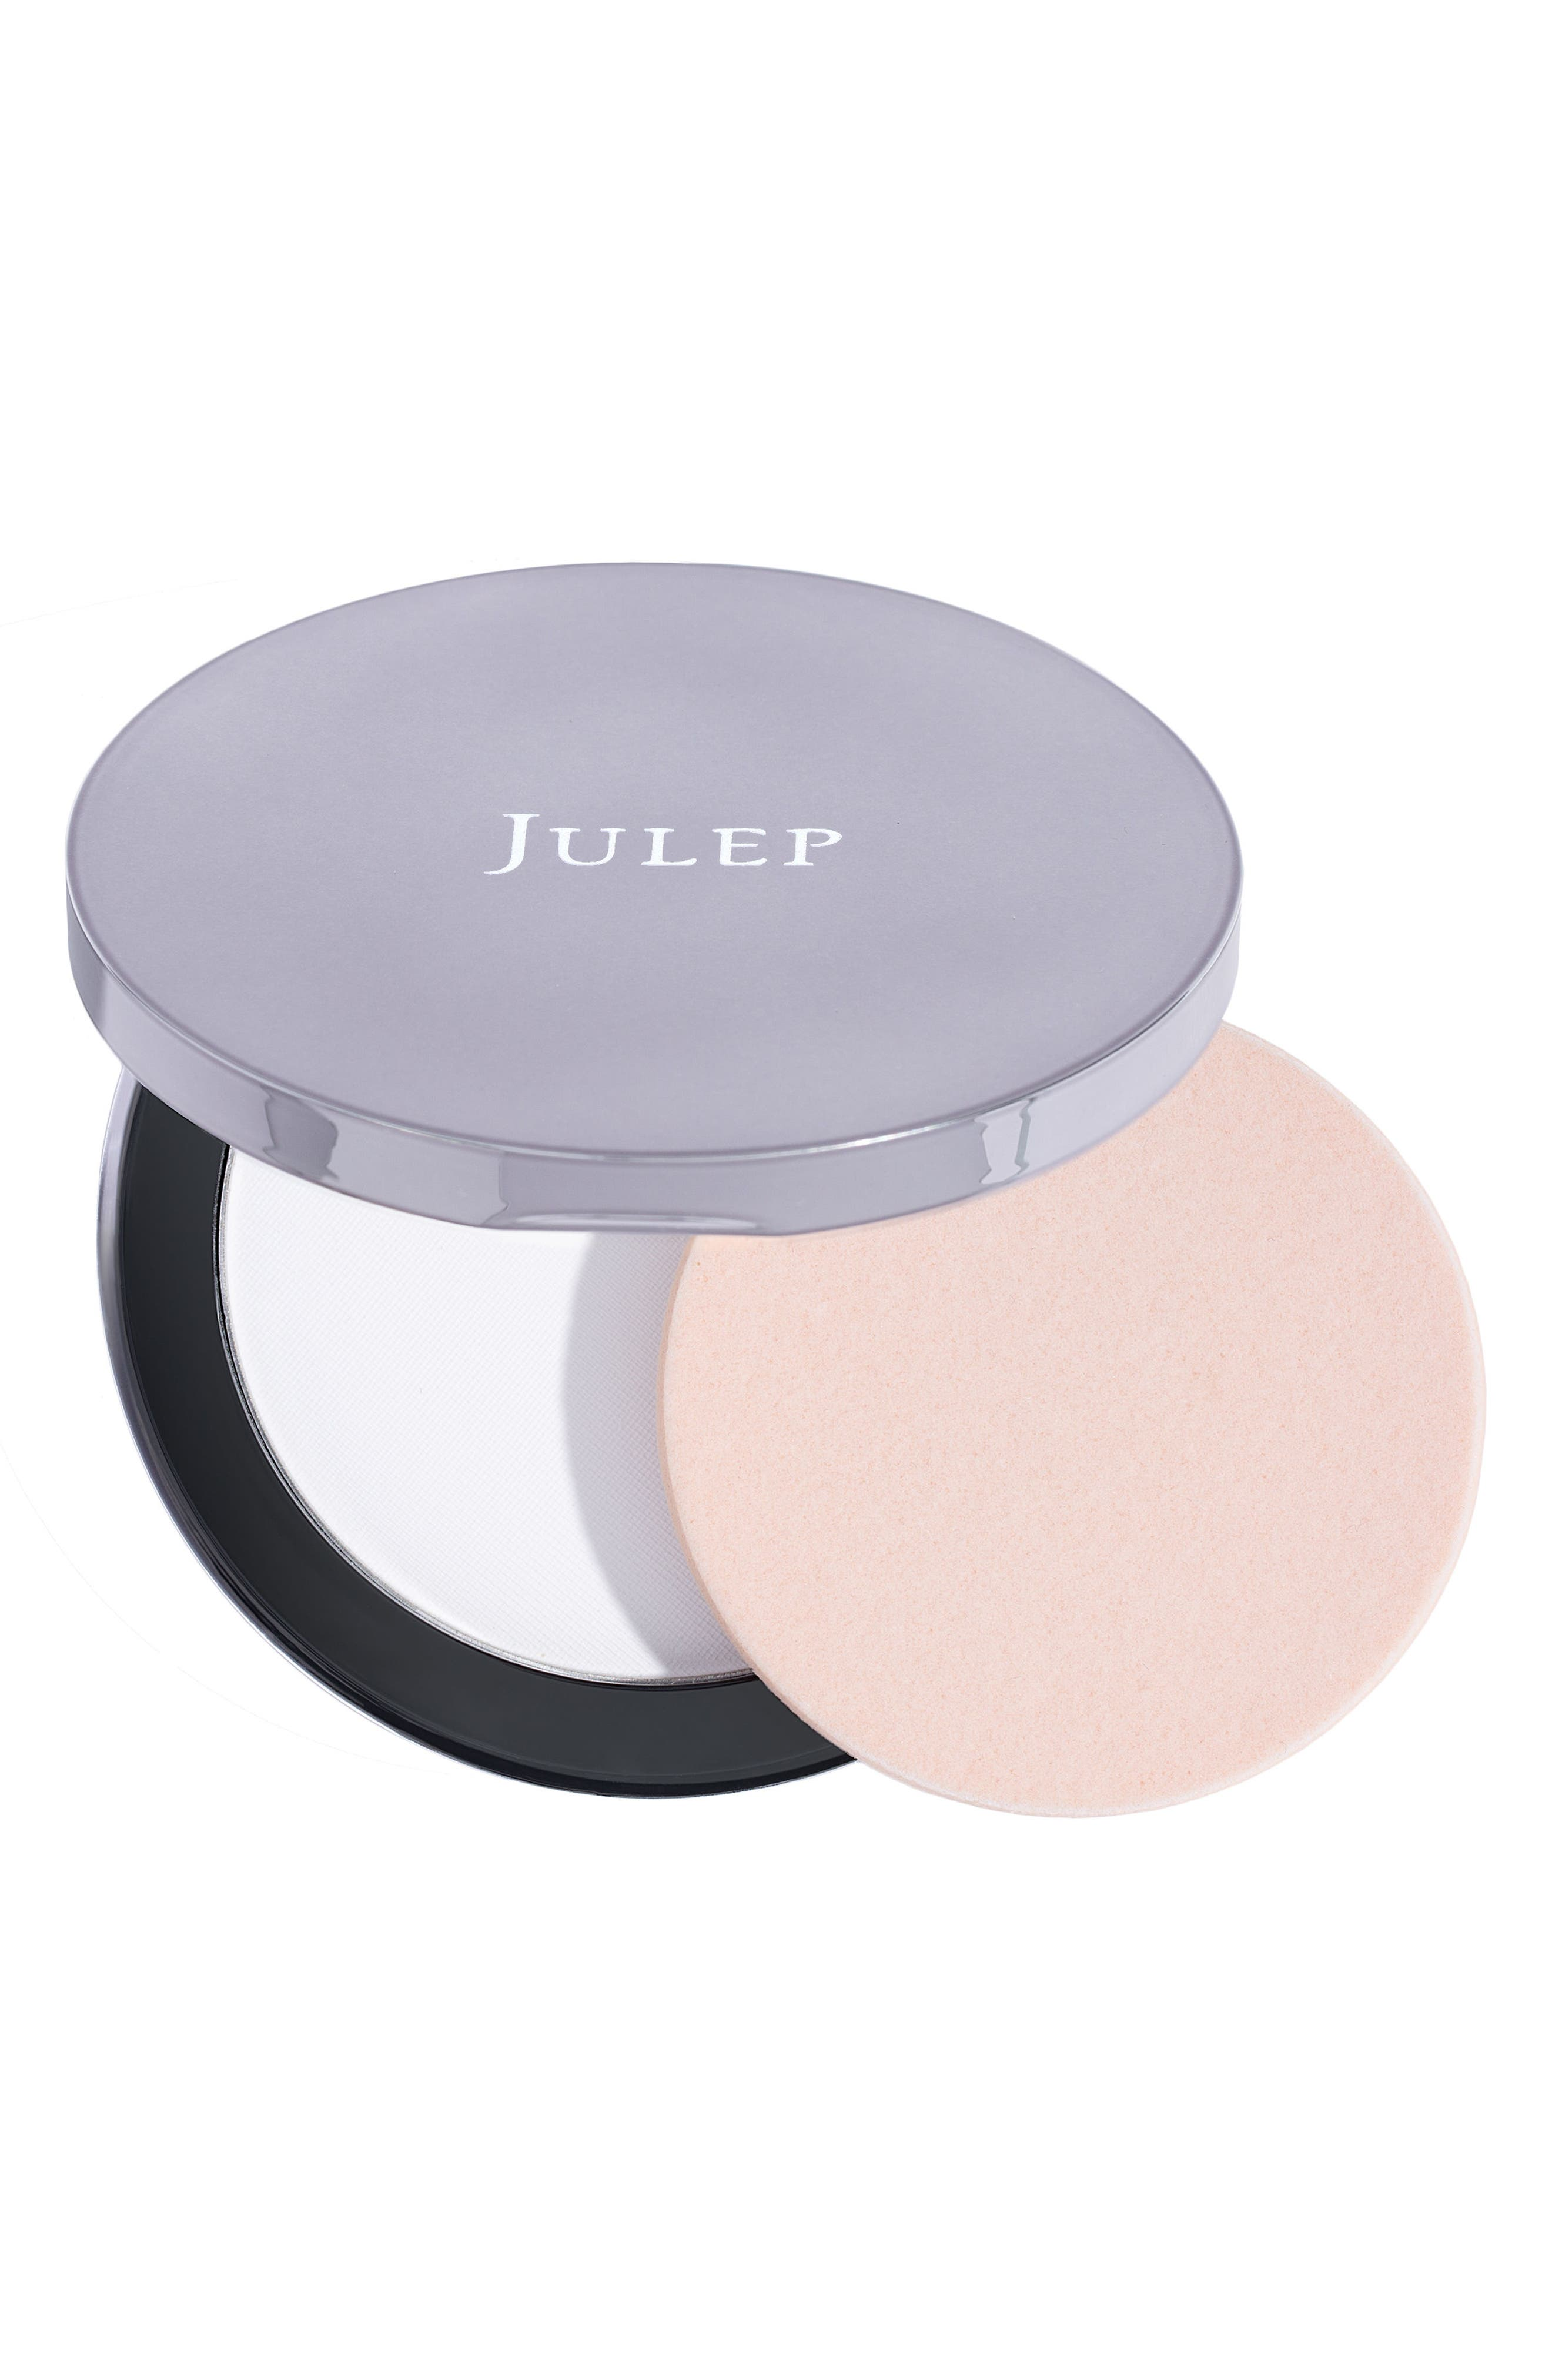 Julep<sup>™</sup> Insta-Filter Invisible Finishing Powder,                         Main,                         color, NO COLOR